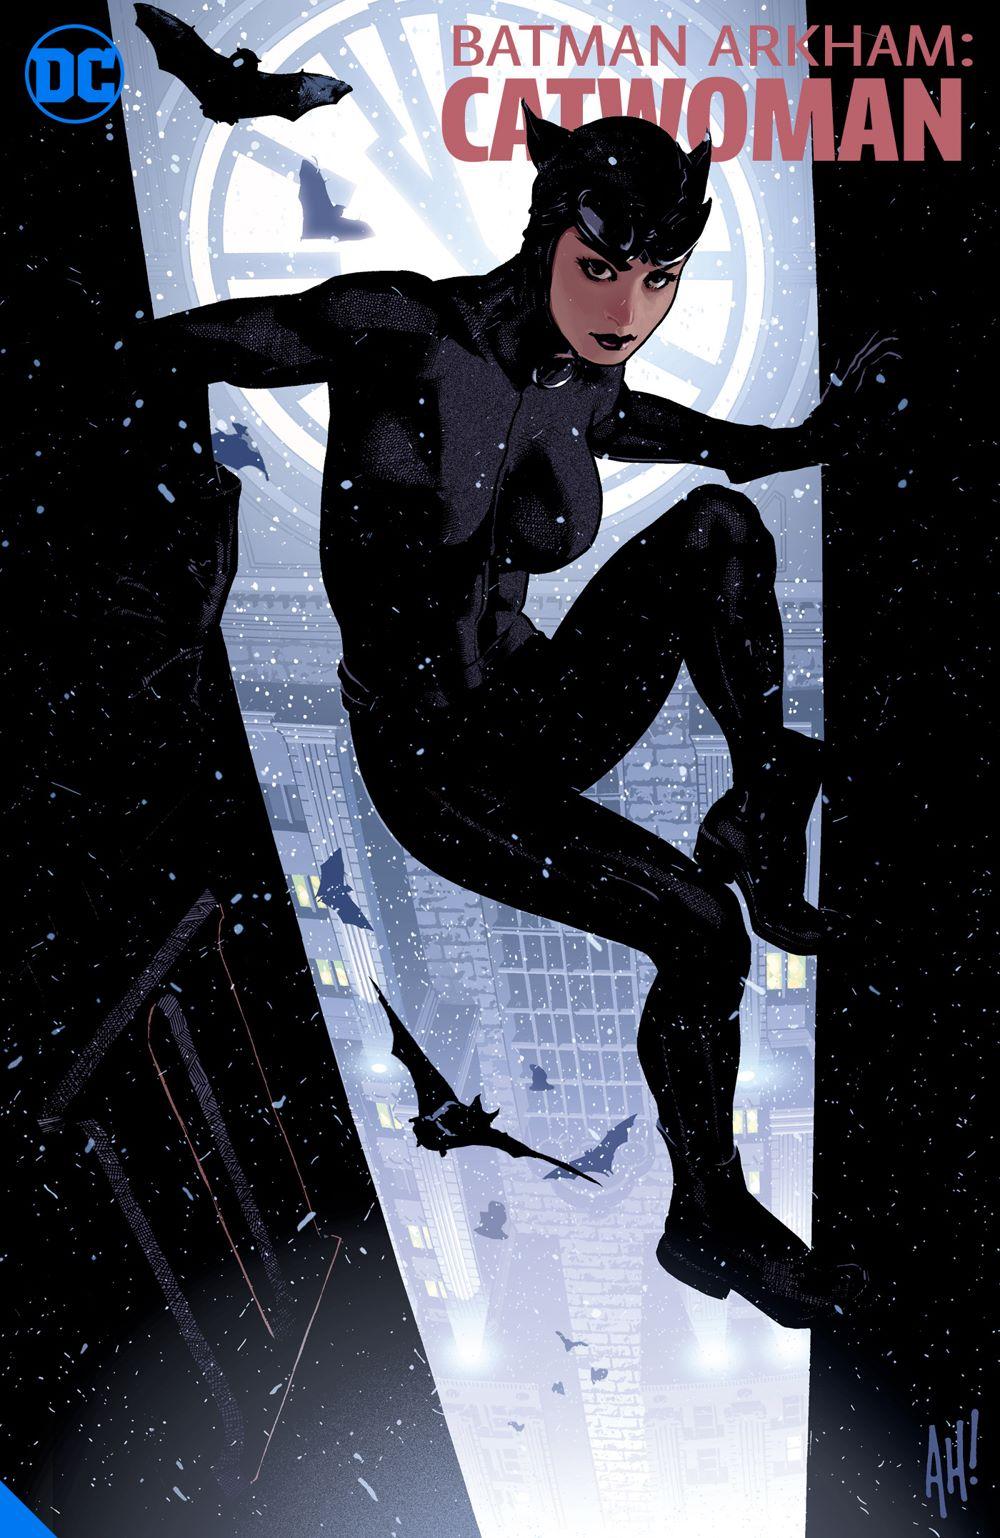 batmanarkhamcatwoman_adv DC Comics August 2021 Solicitations